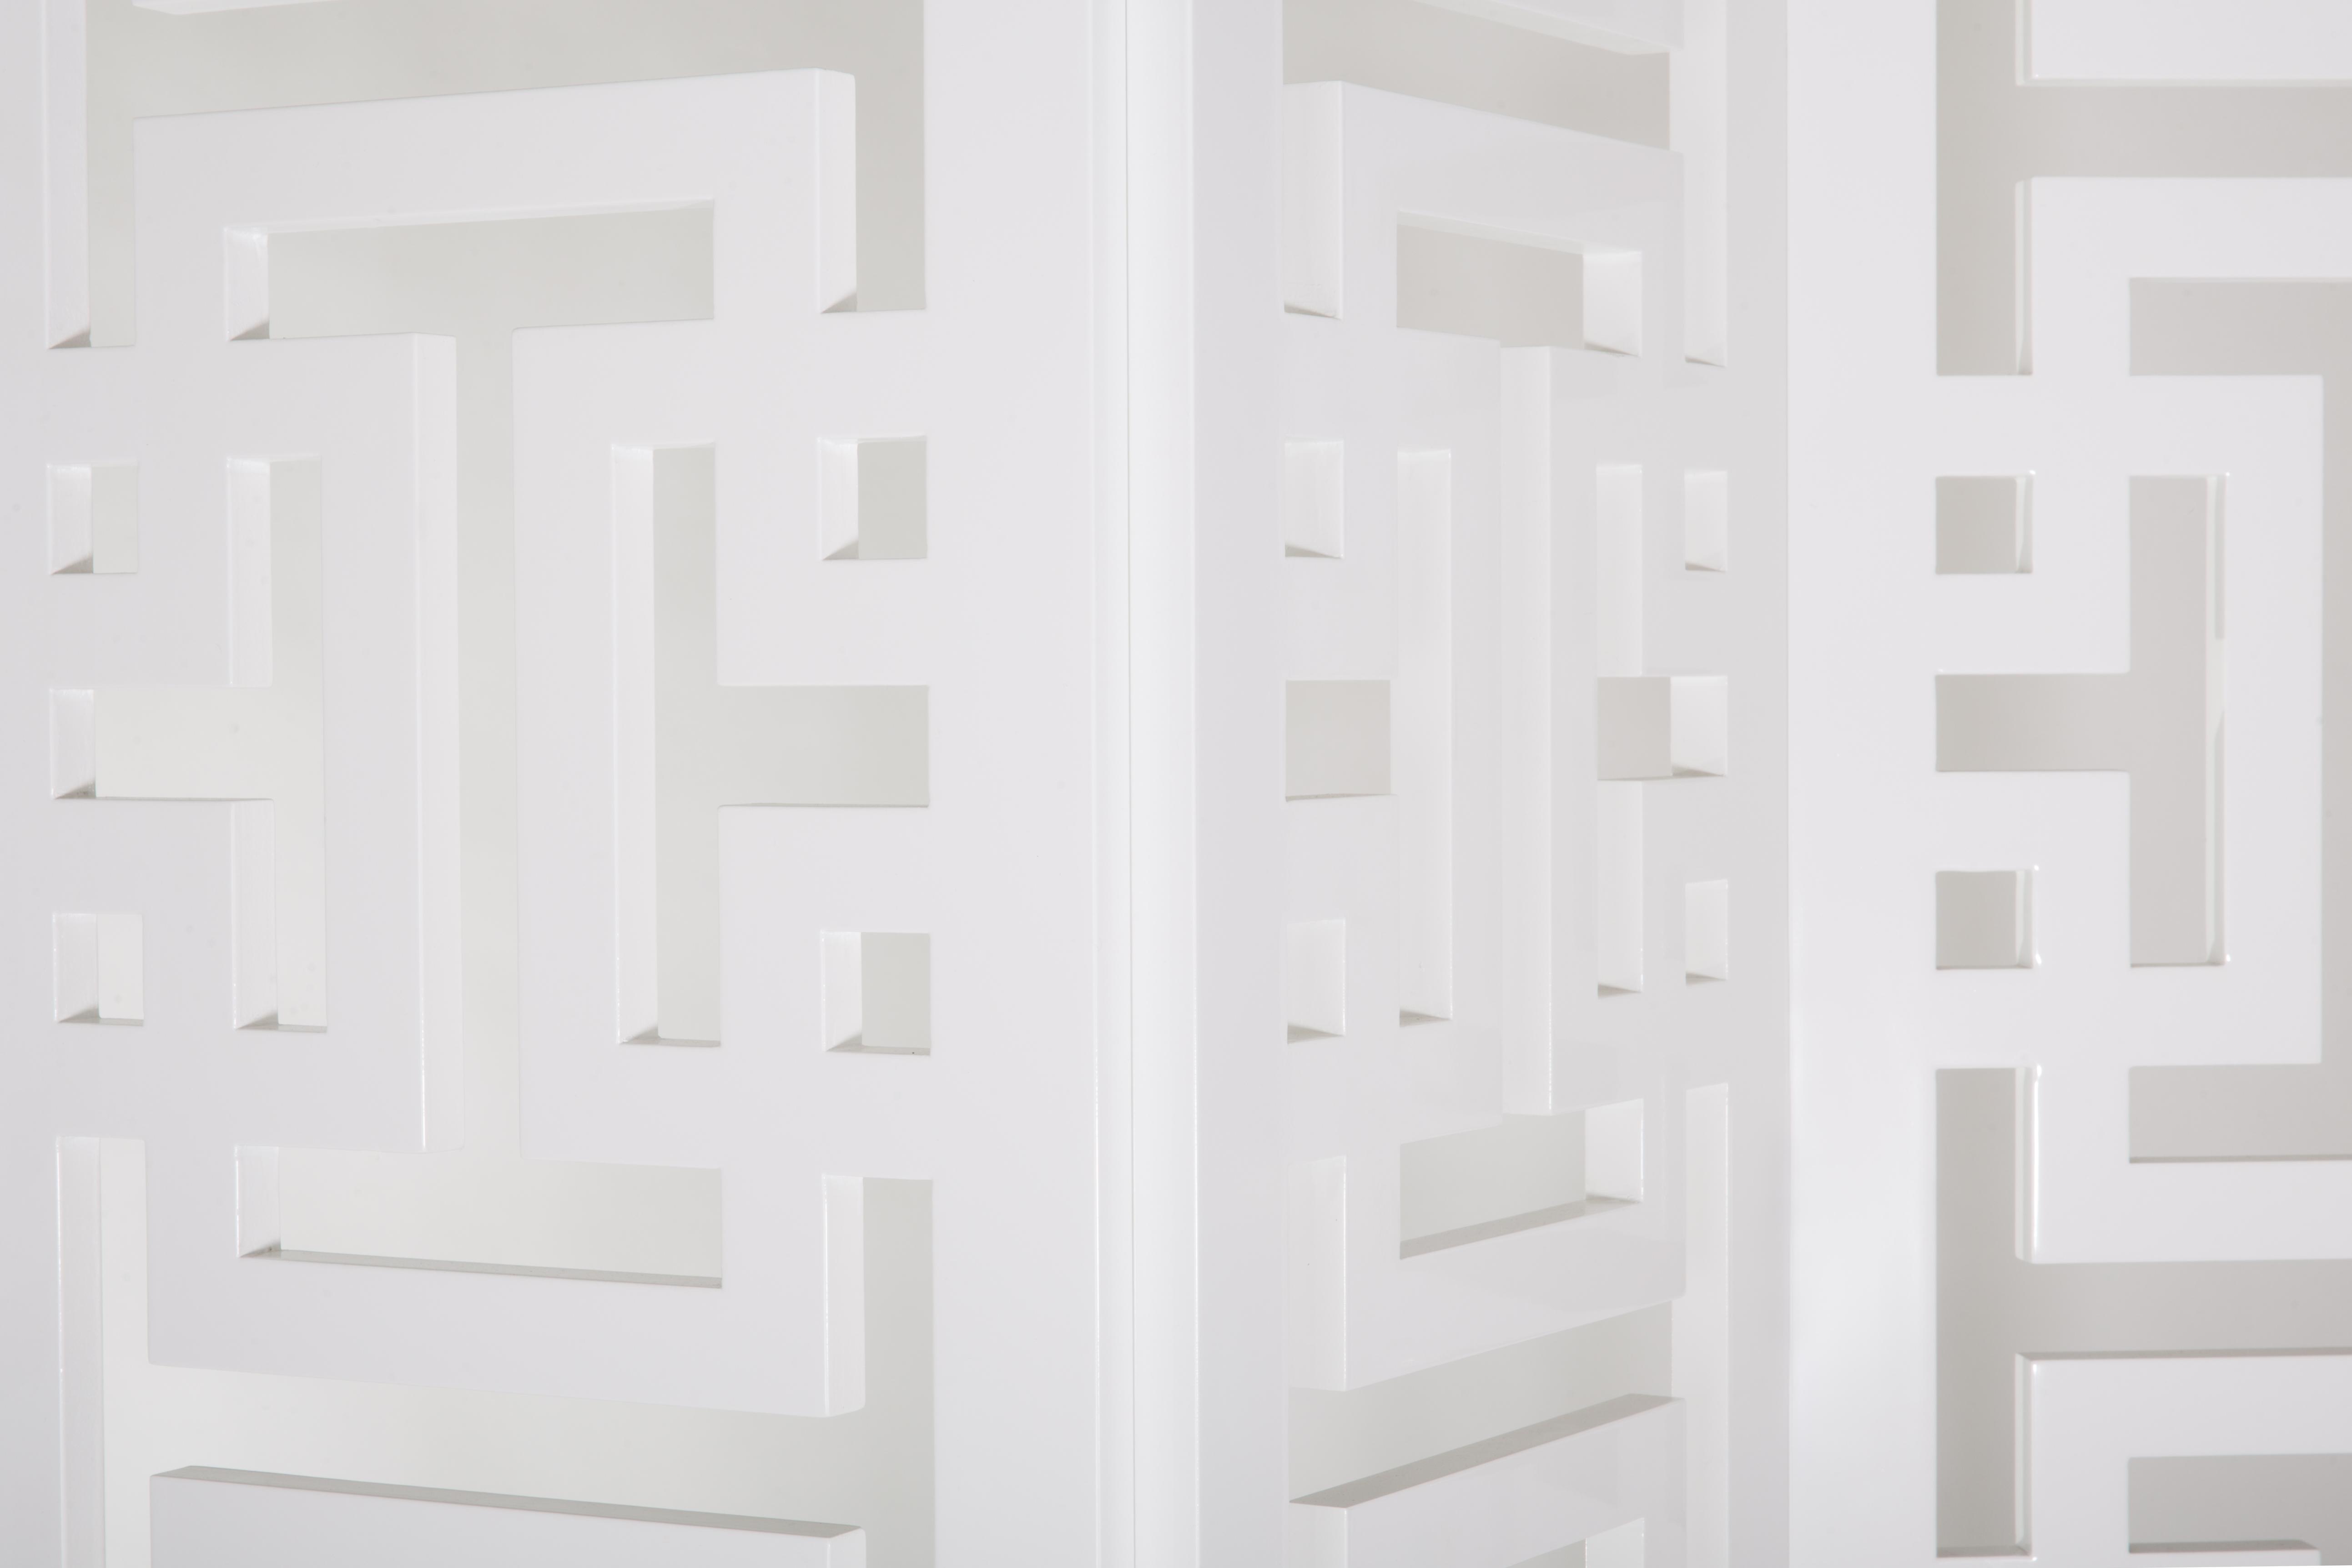 Labyrinth detail